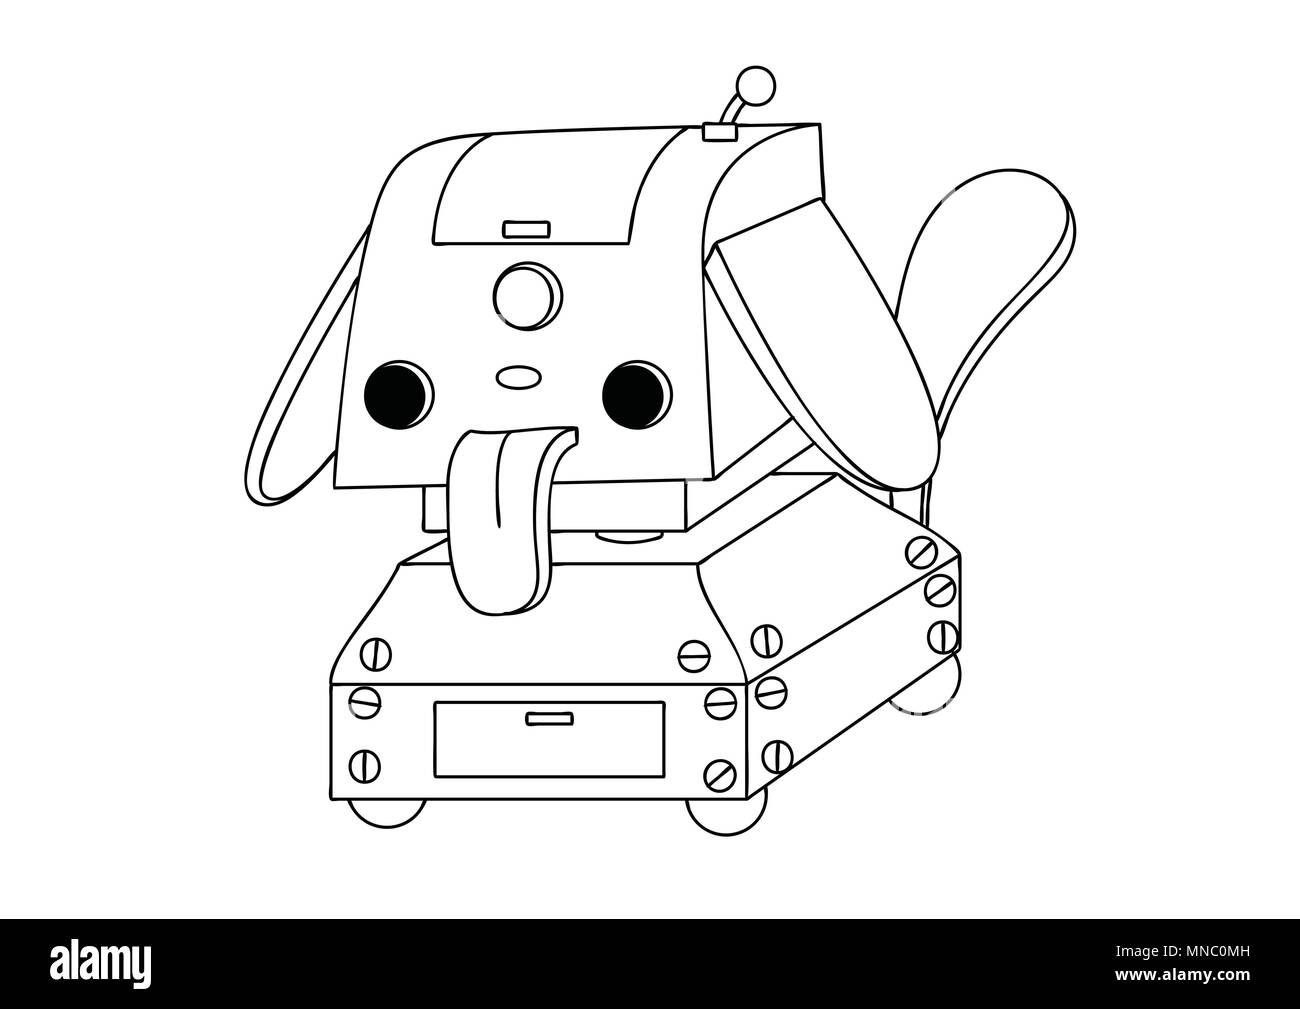 Linda Mascota Robot Dibujados A Mano Para El Elemento De